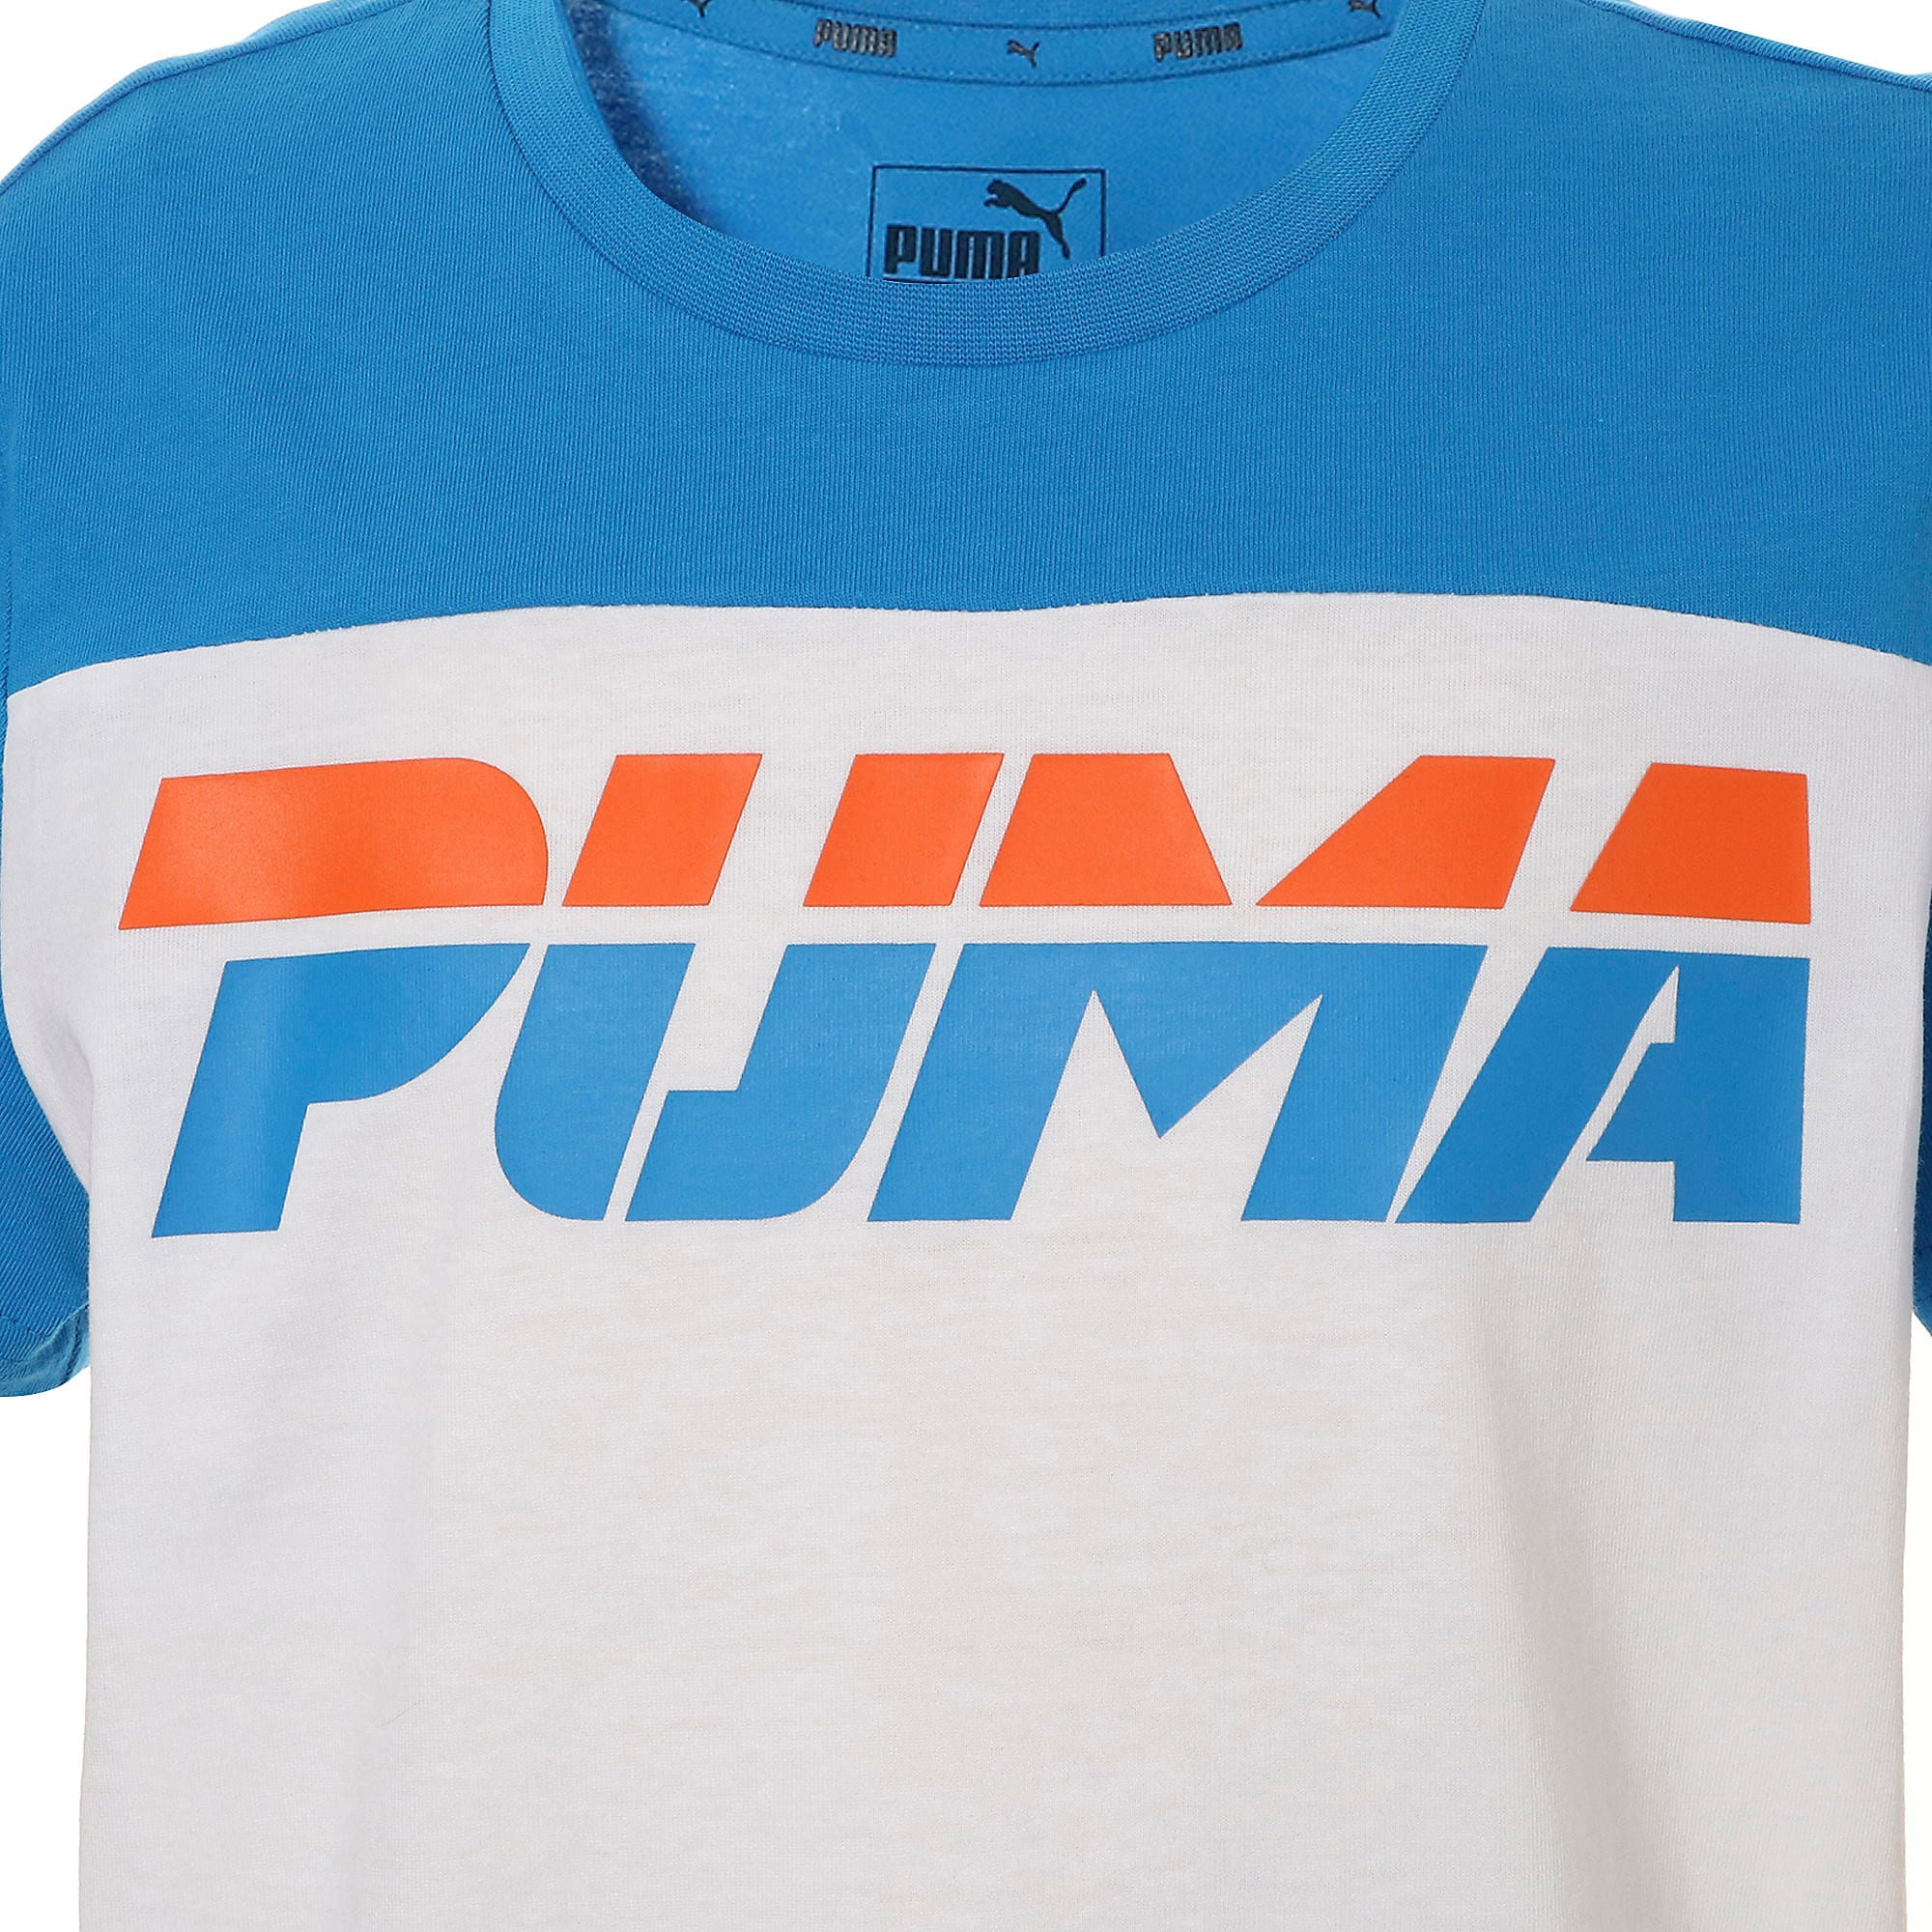 Thumbnail 4 of キッズ ALPHA SS トレンド Tシャツ 半袖, Puma White, medium-JPN